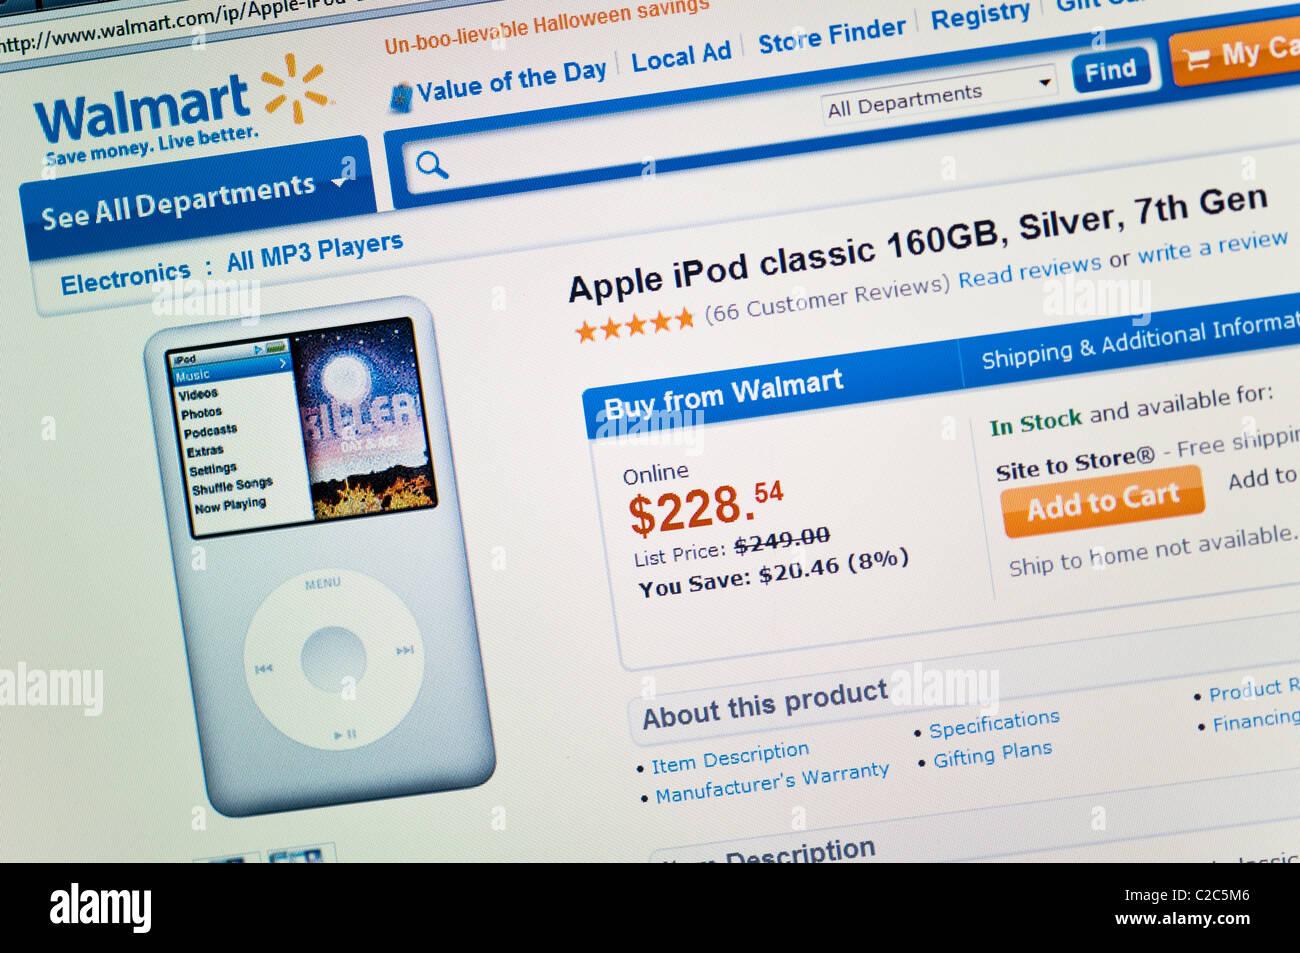 Walmart Website Screenshot Stock Photo, Royalty Free Image Aldi How To